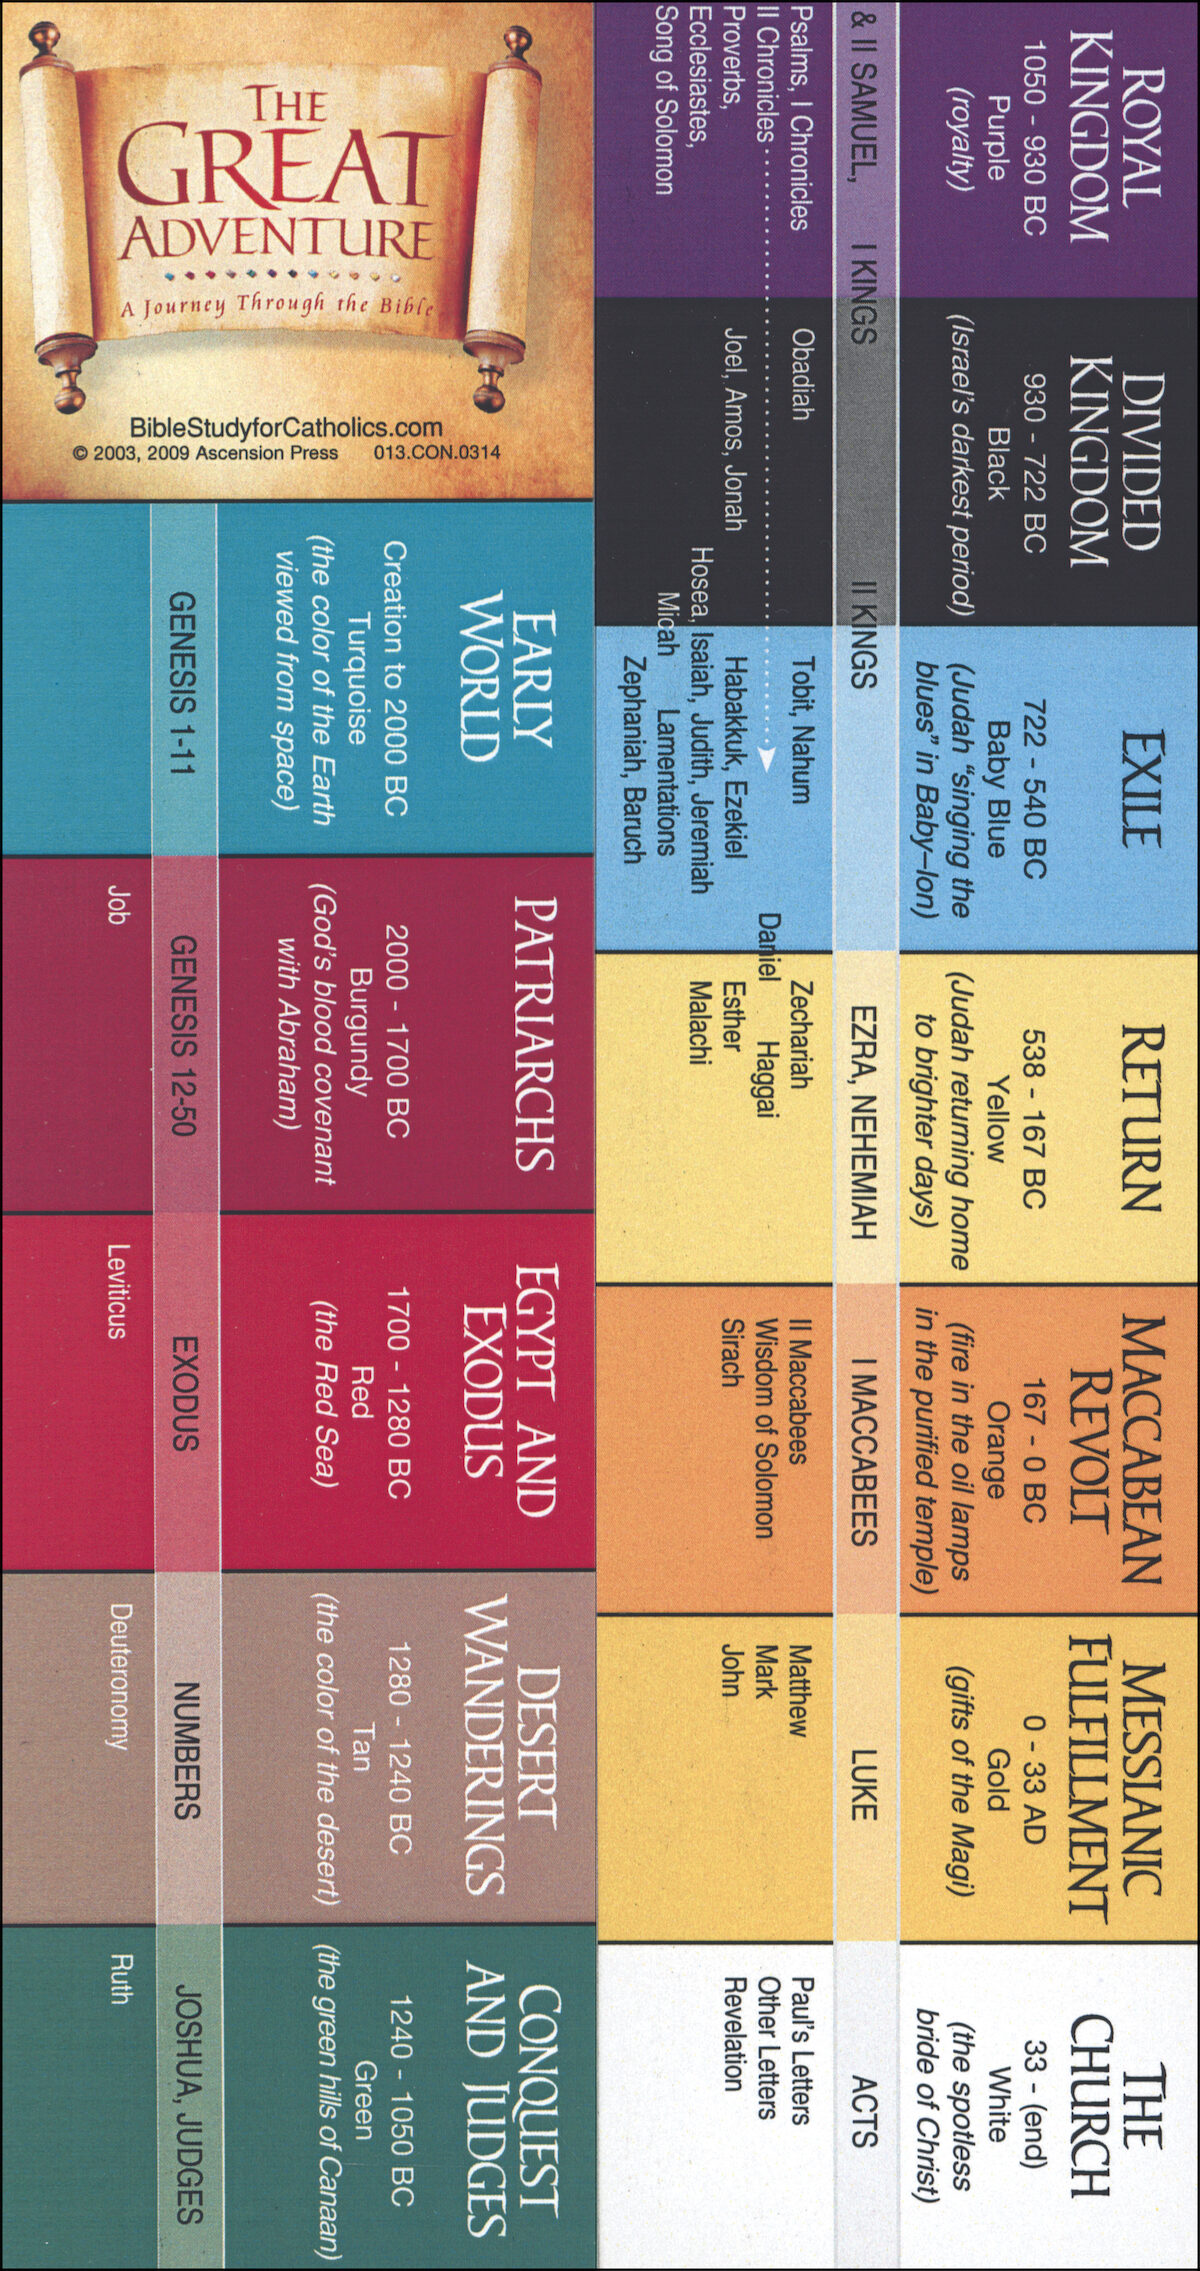 Bible Timeline Bible